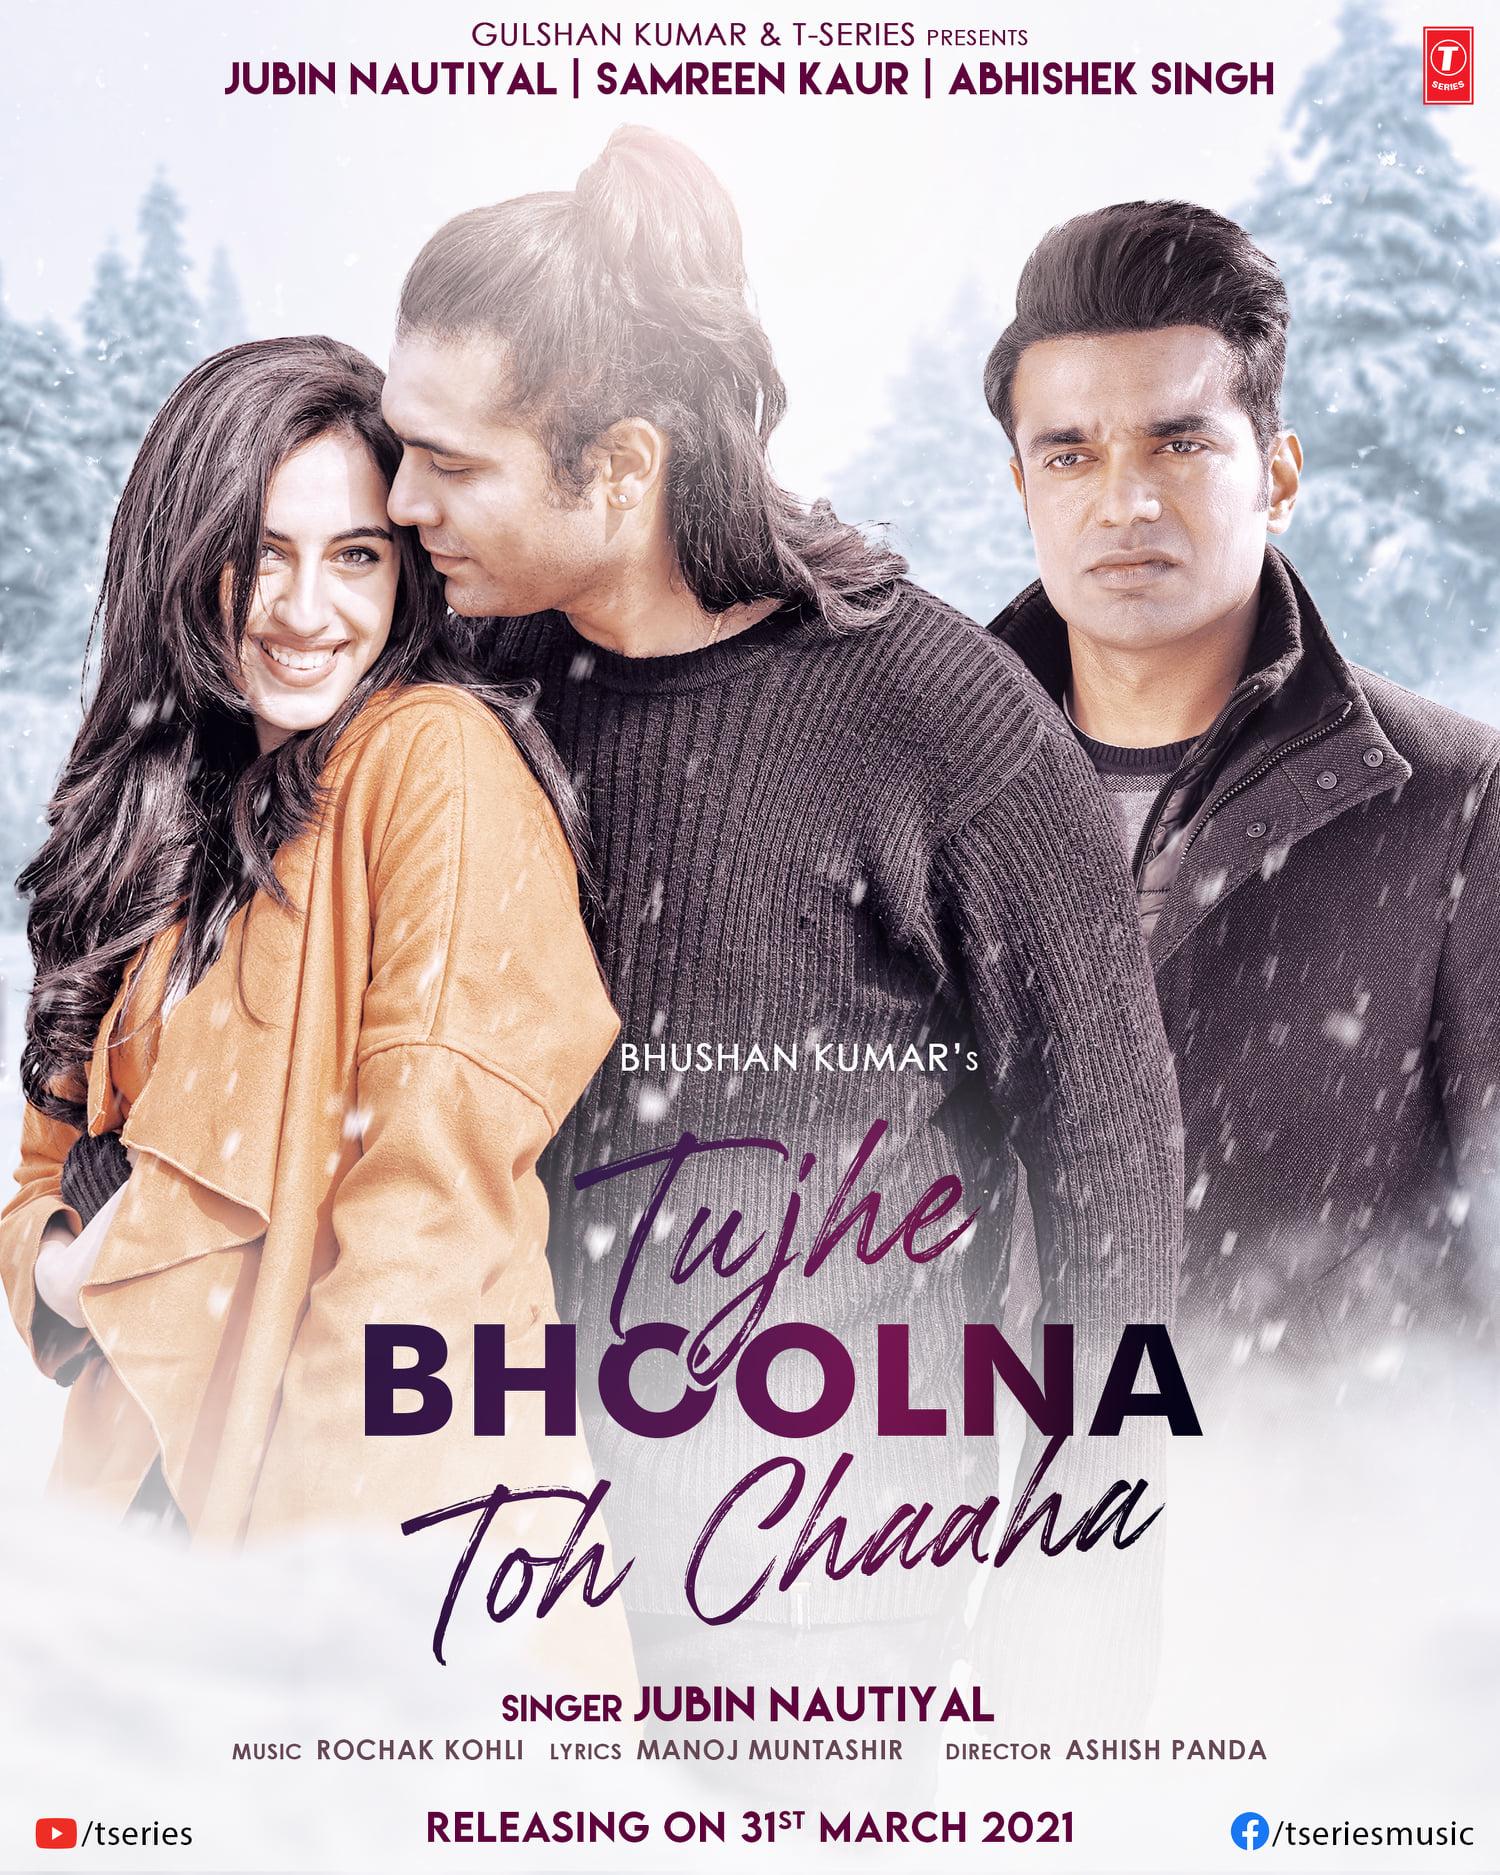 Tujhe Bhoolna Toh Chaaha By Jubin Nautiyal & Samreen Kaur Official Music Video (2021) HD